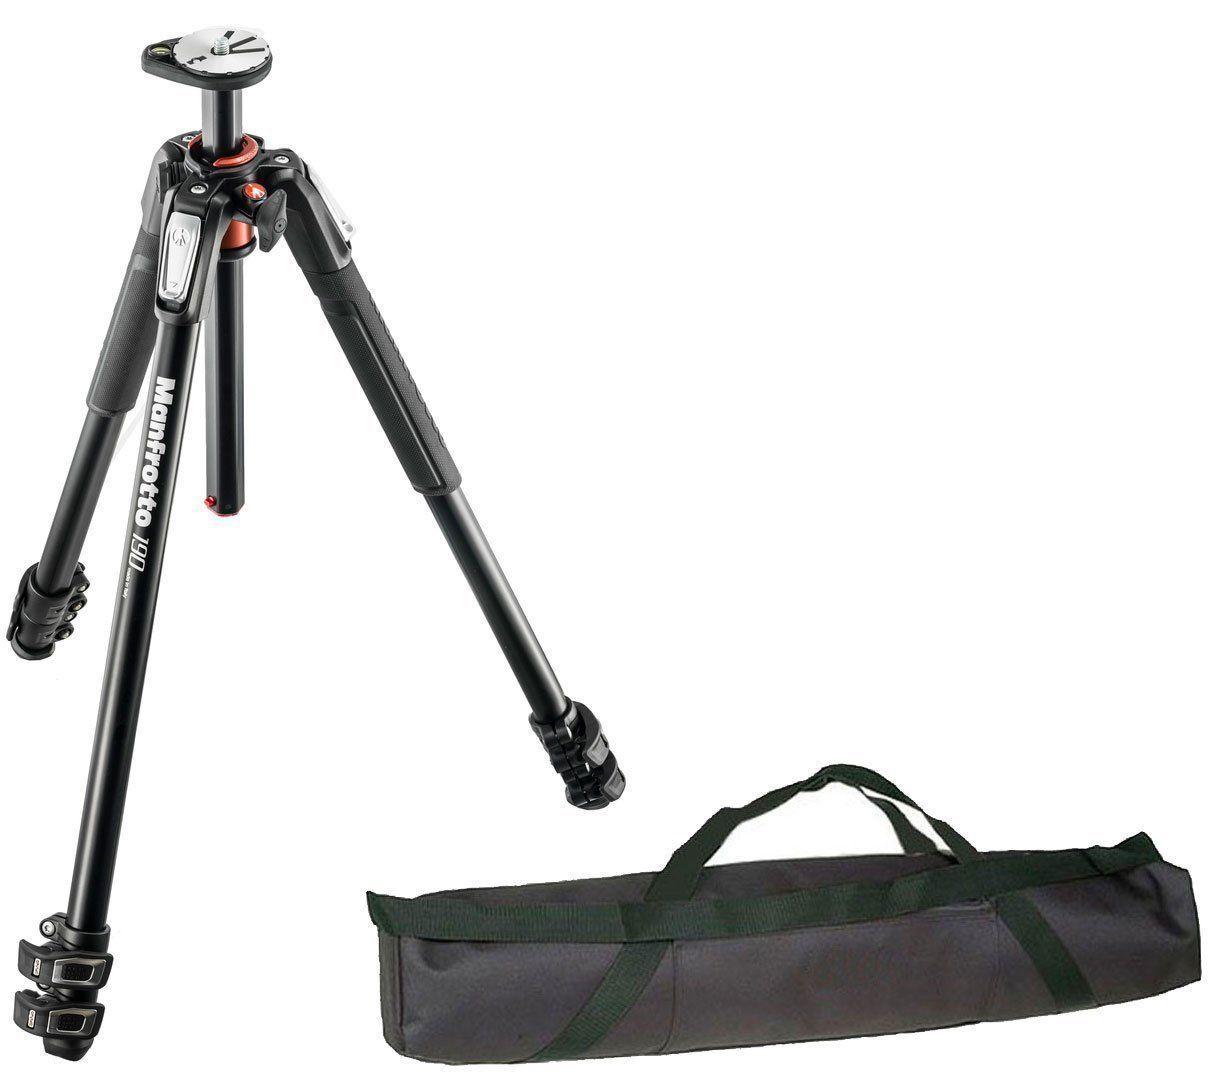 Manfrotto Mt190xpro3 3 Section Aluminum Tripod Legs W 35 Carrying Vanguard Veo 265cb Carbon Fiber Case